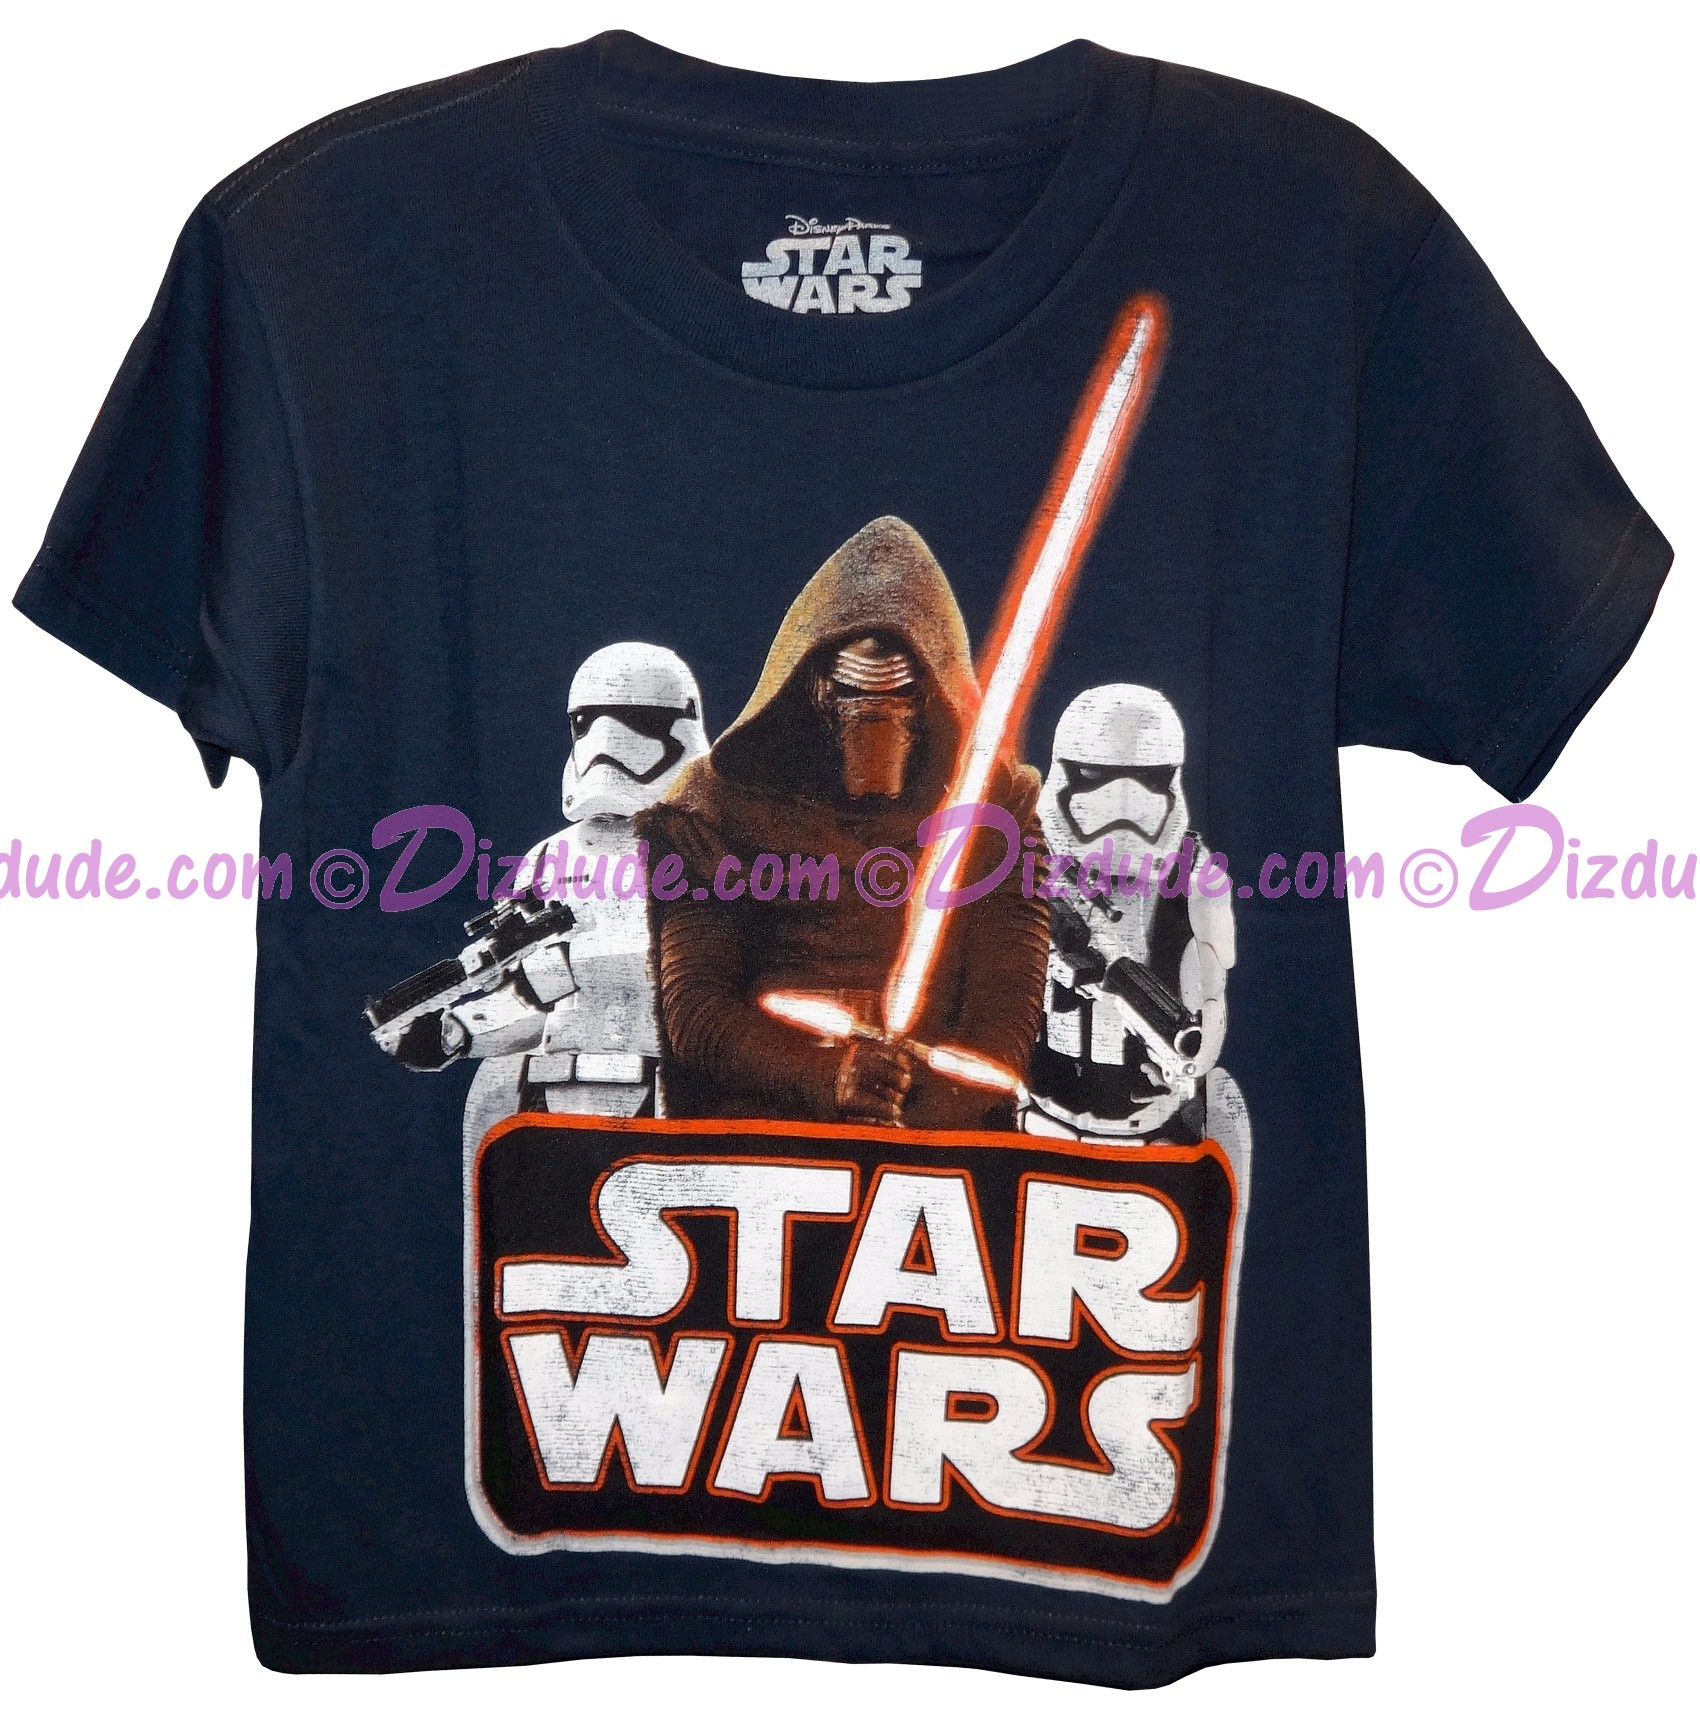 Badge Bunch Youth T-Shirt (Tshirt, T shirt or Tee) from Disney Star Wars: The Force Awakens © Dizdude.com